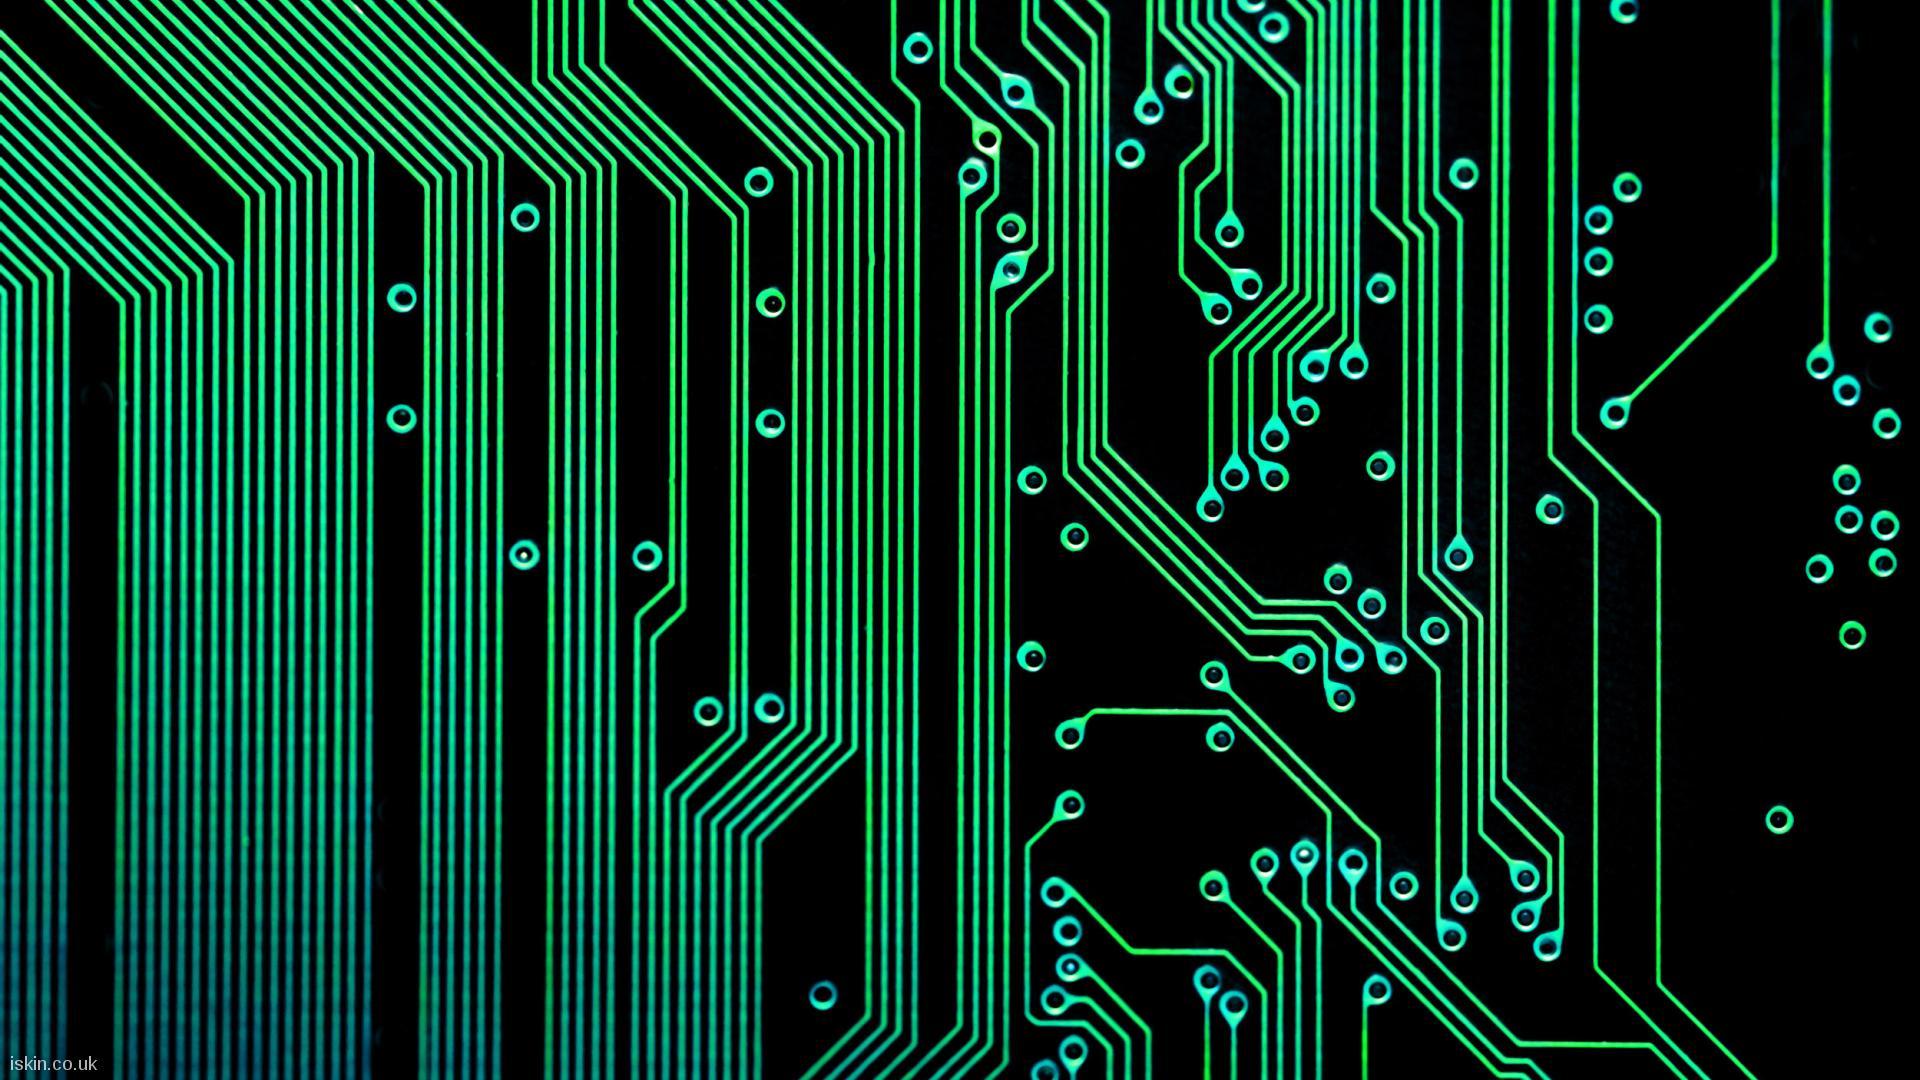 Electronic Circuits Desktop Wallpaper Iskin Co Uk